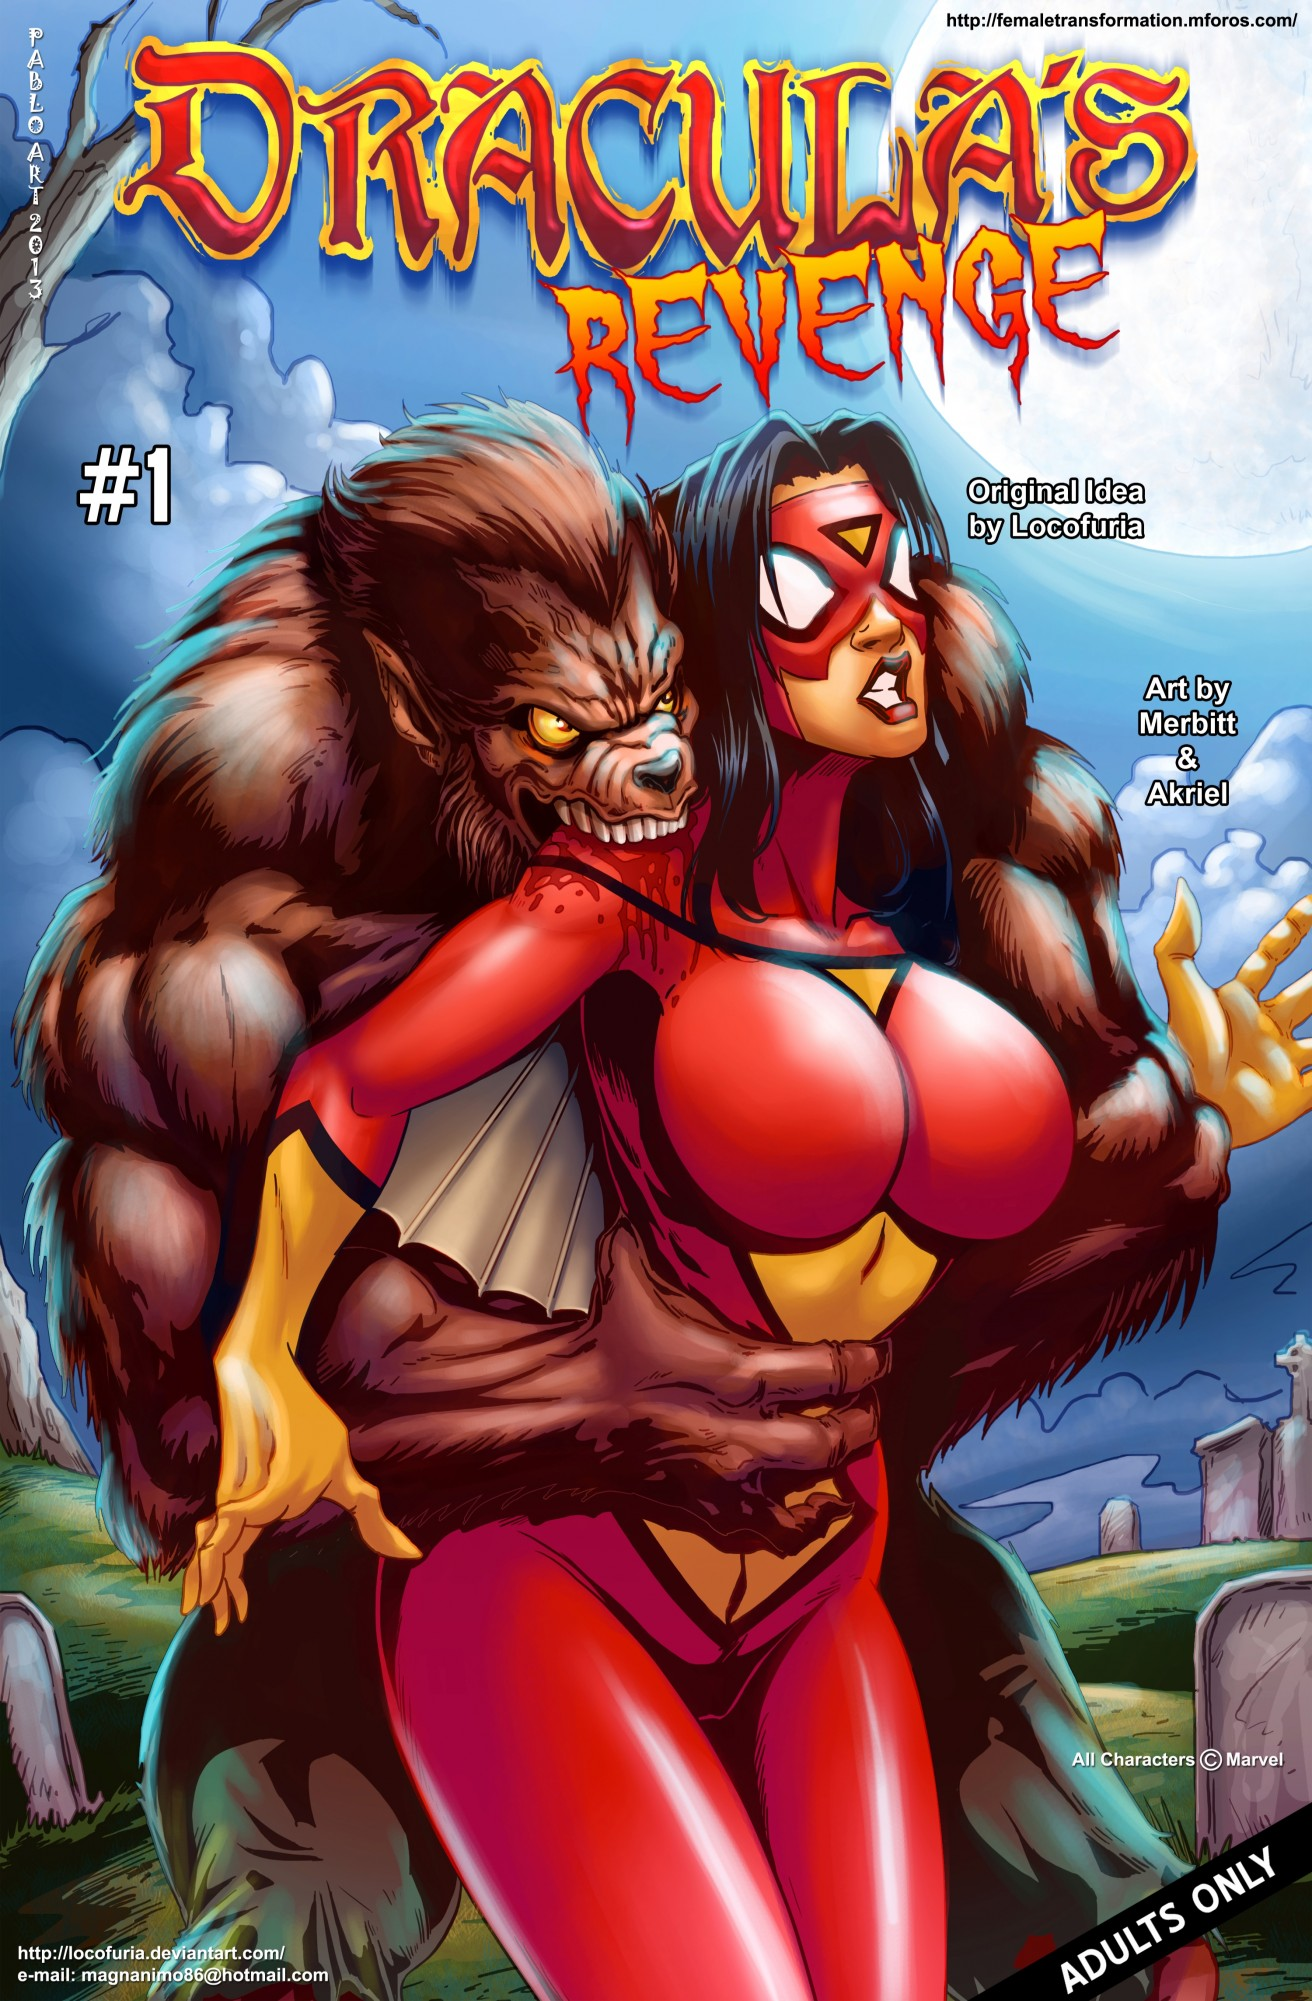 Goodcomix Spider-Woman - [Locofuria] - Draculas Revenge